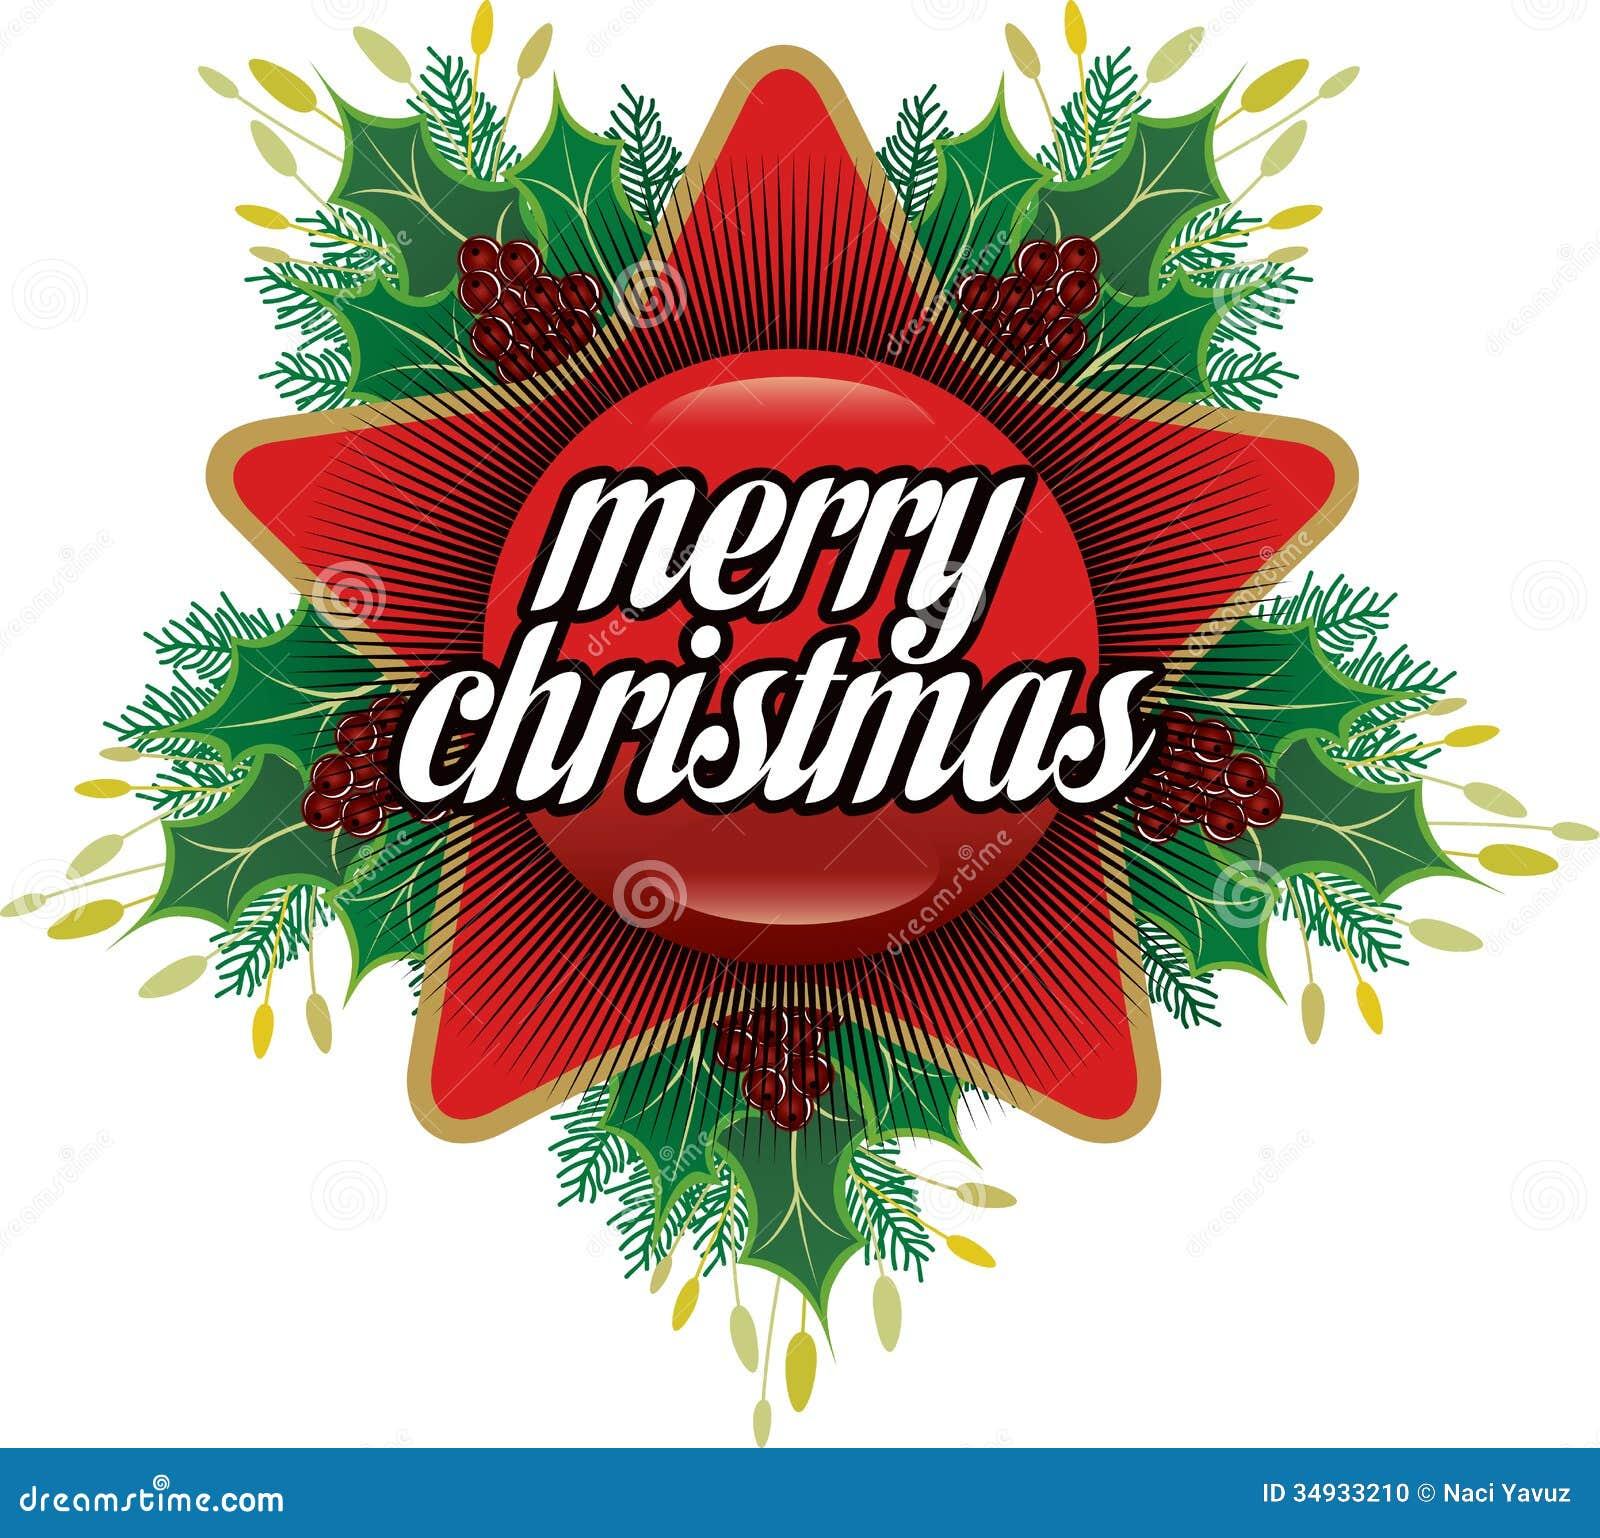 Christmas Card stock vector. Illustration of vector, invitation ...